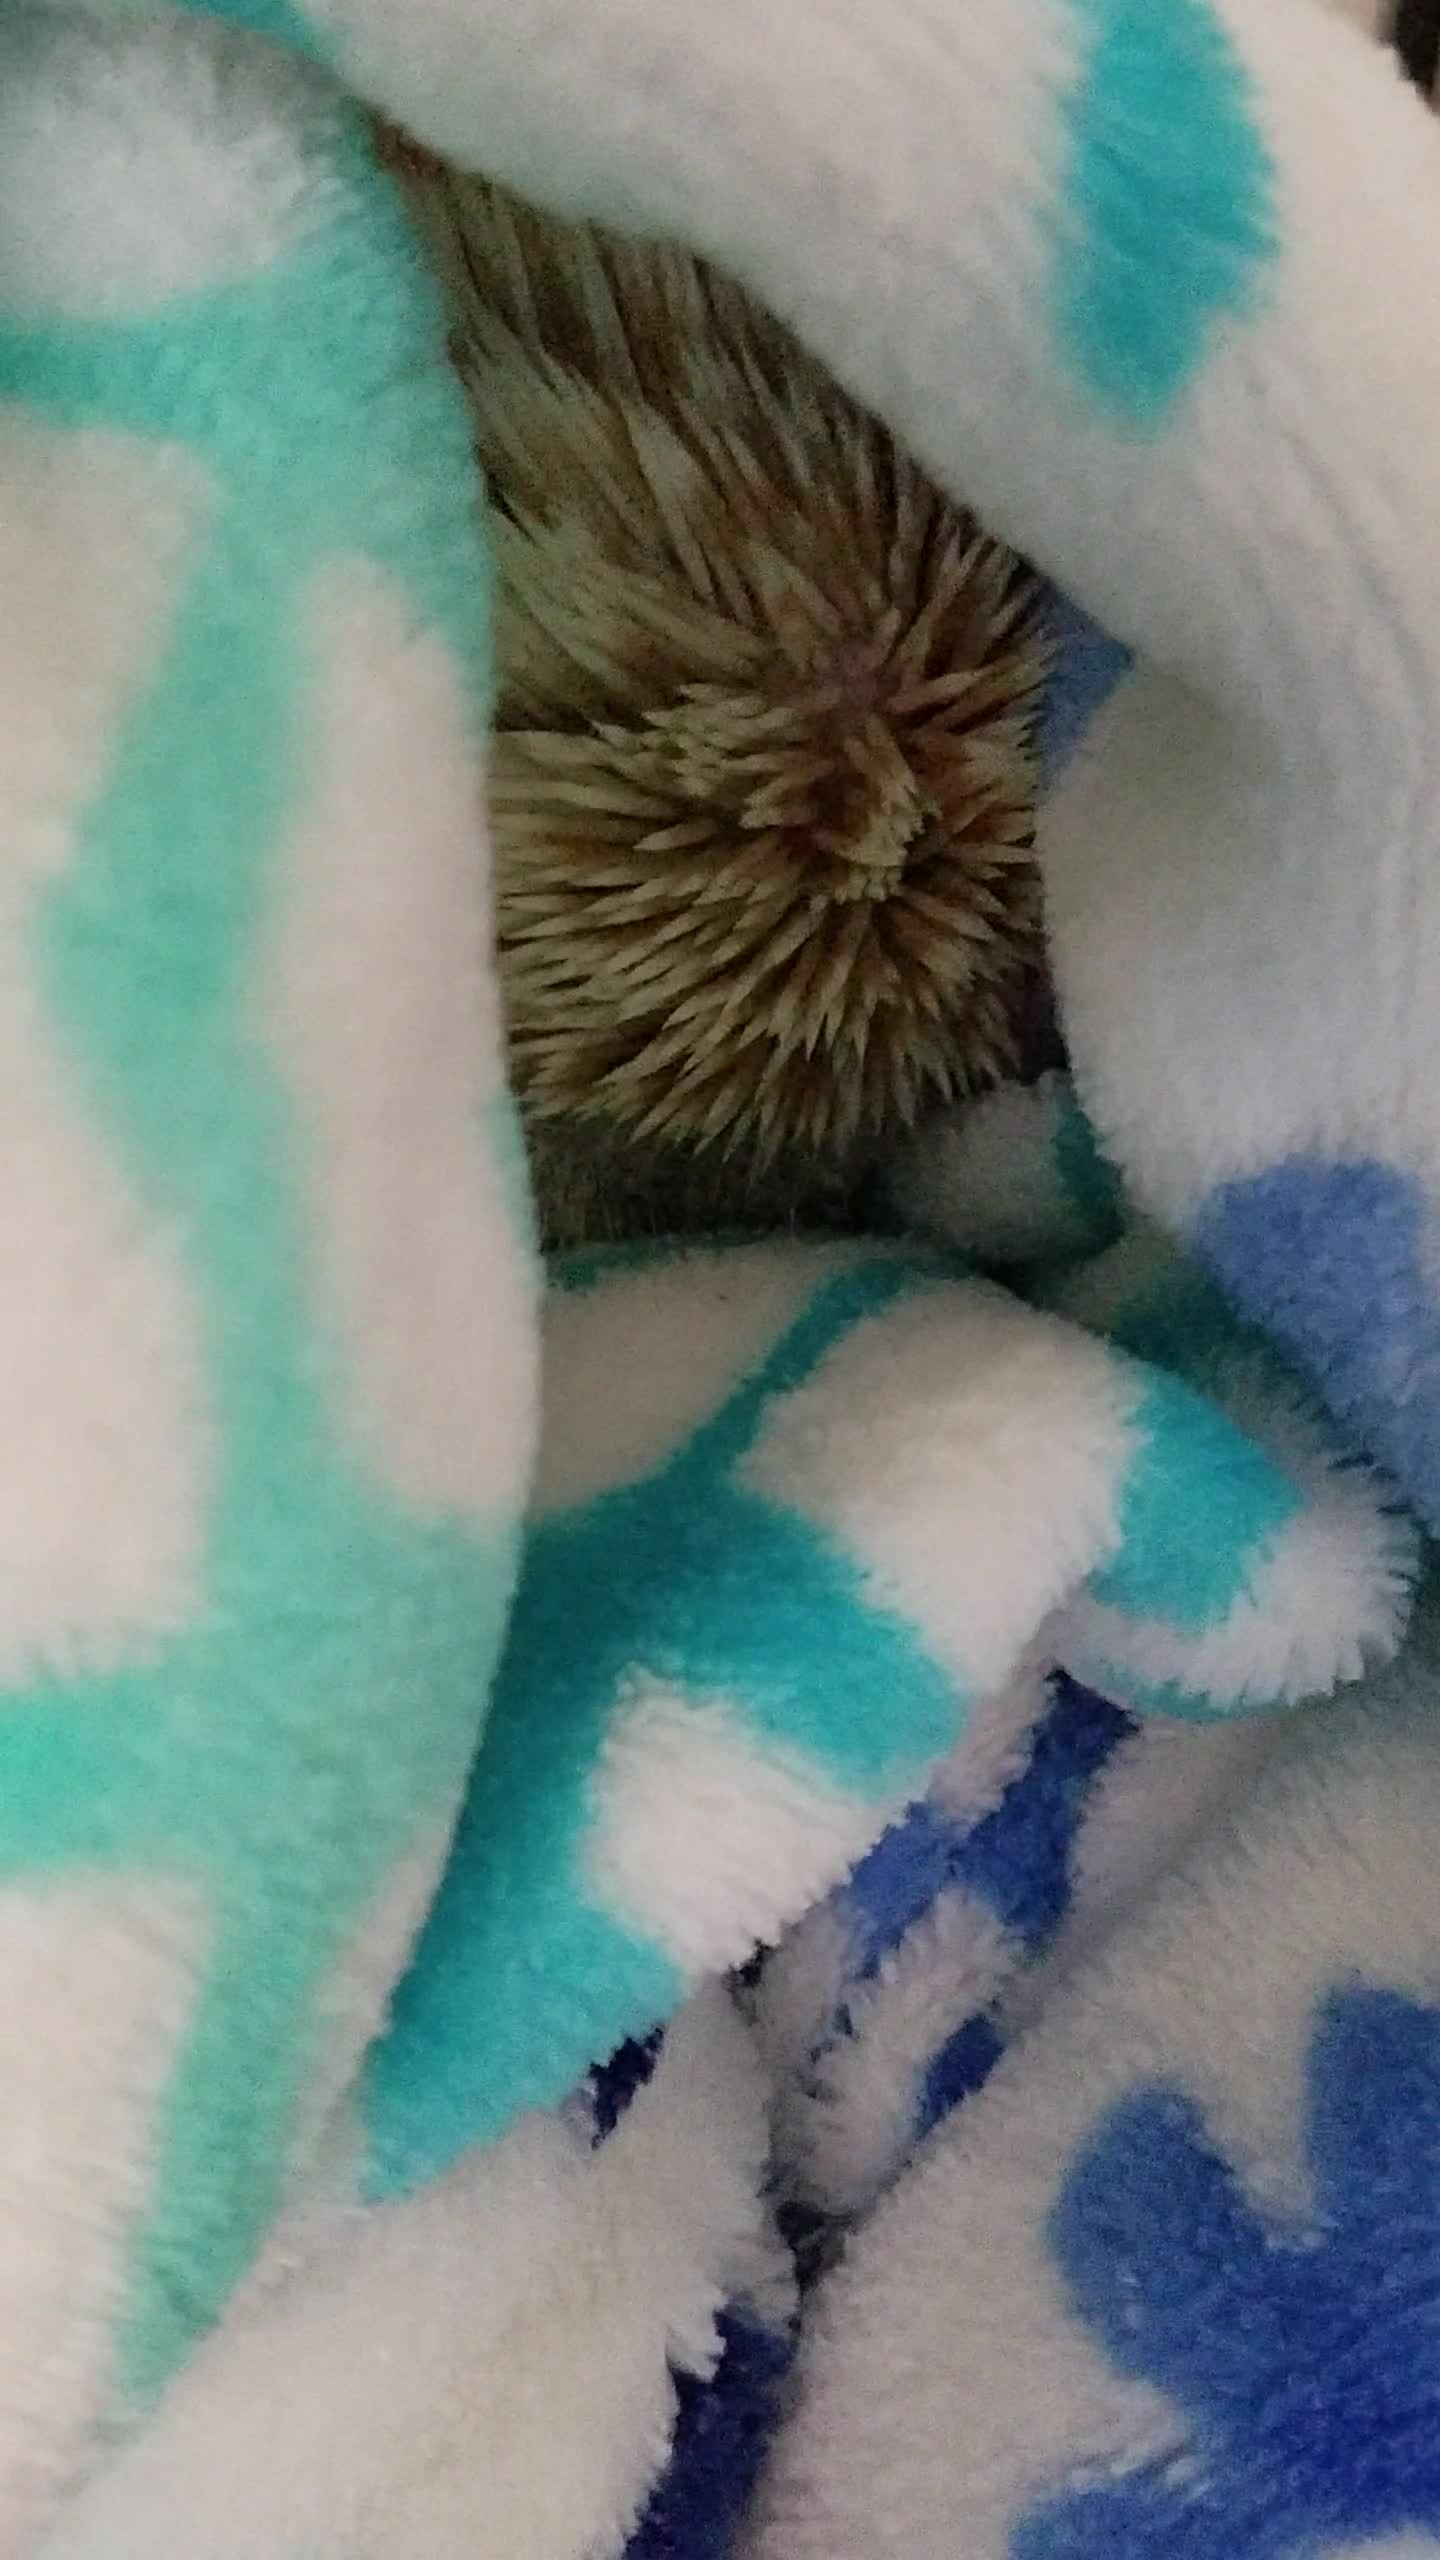 cute, hedgehog, waffles, Hedgehog GIFs